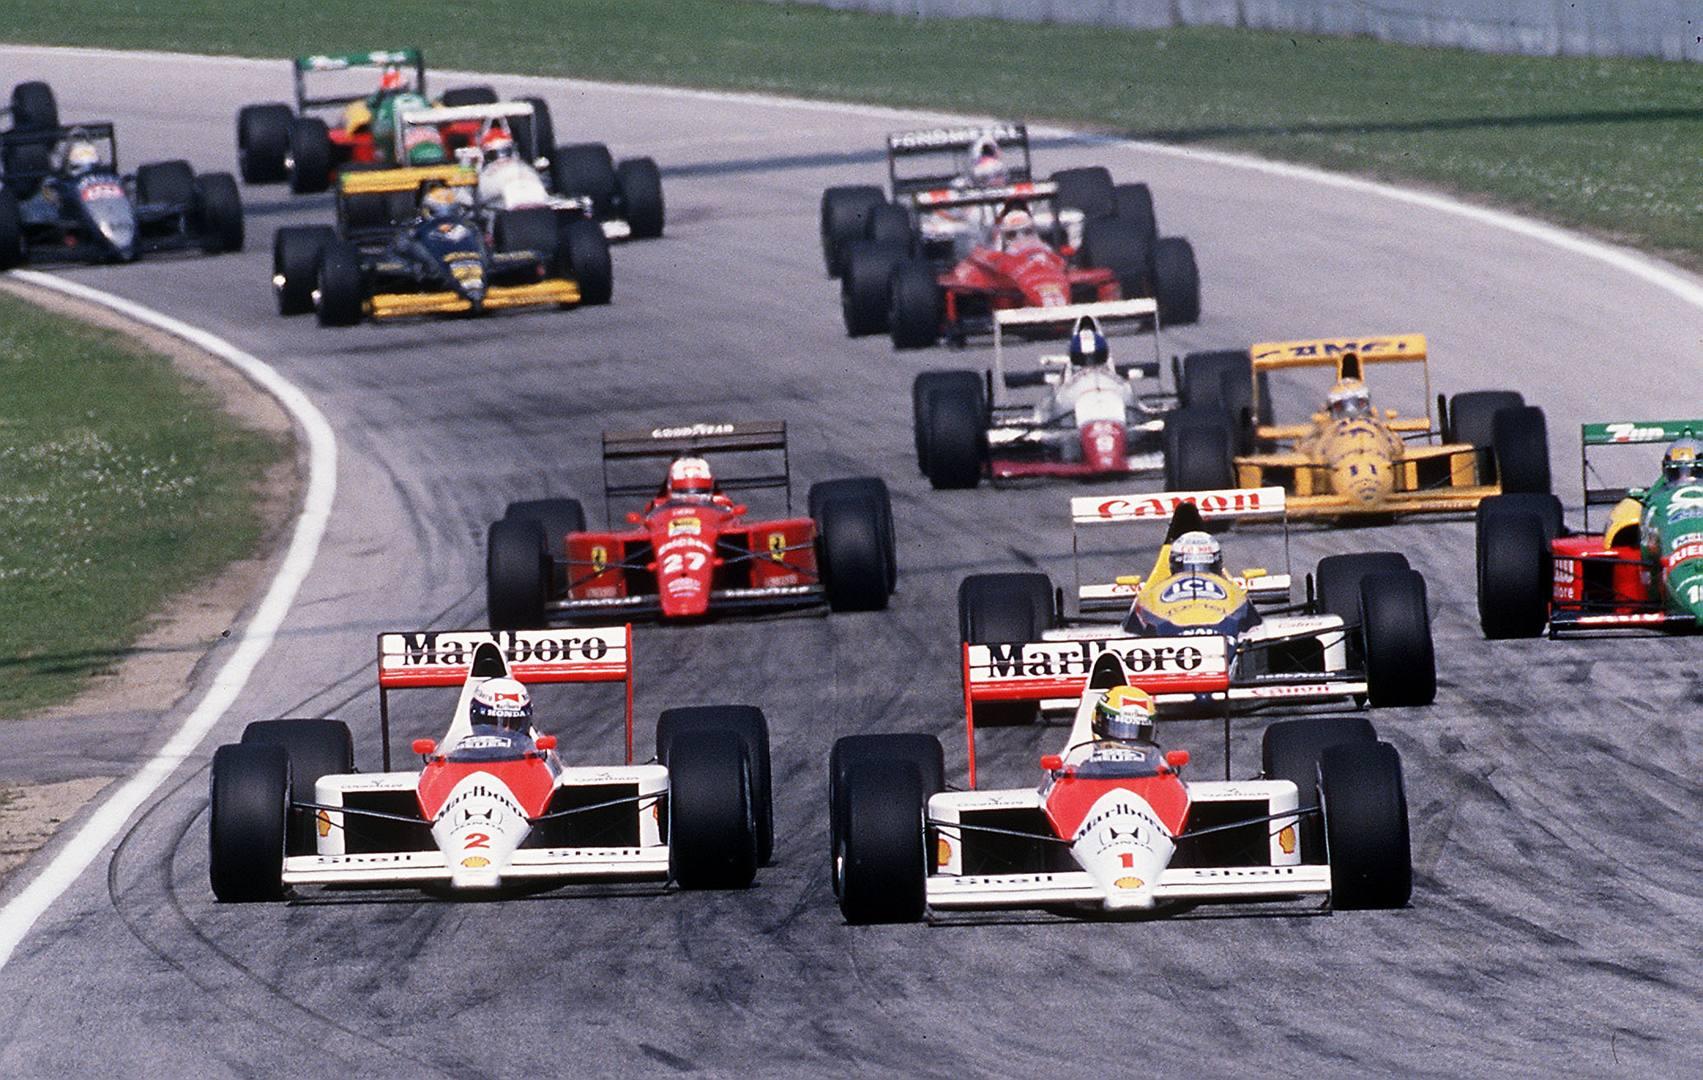 Tickets Formula 1 Emilia Romagna Grand Prix 2020